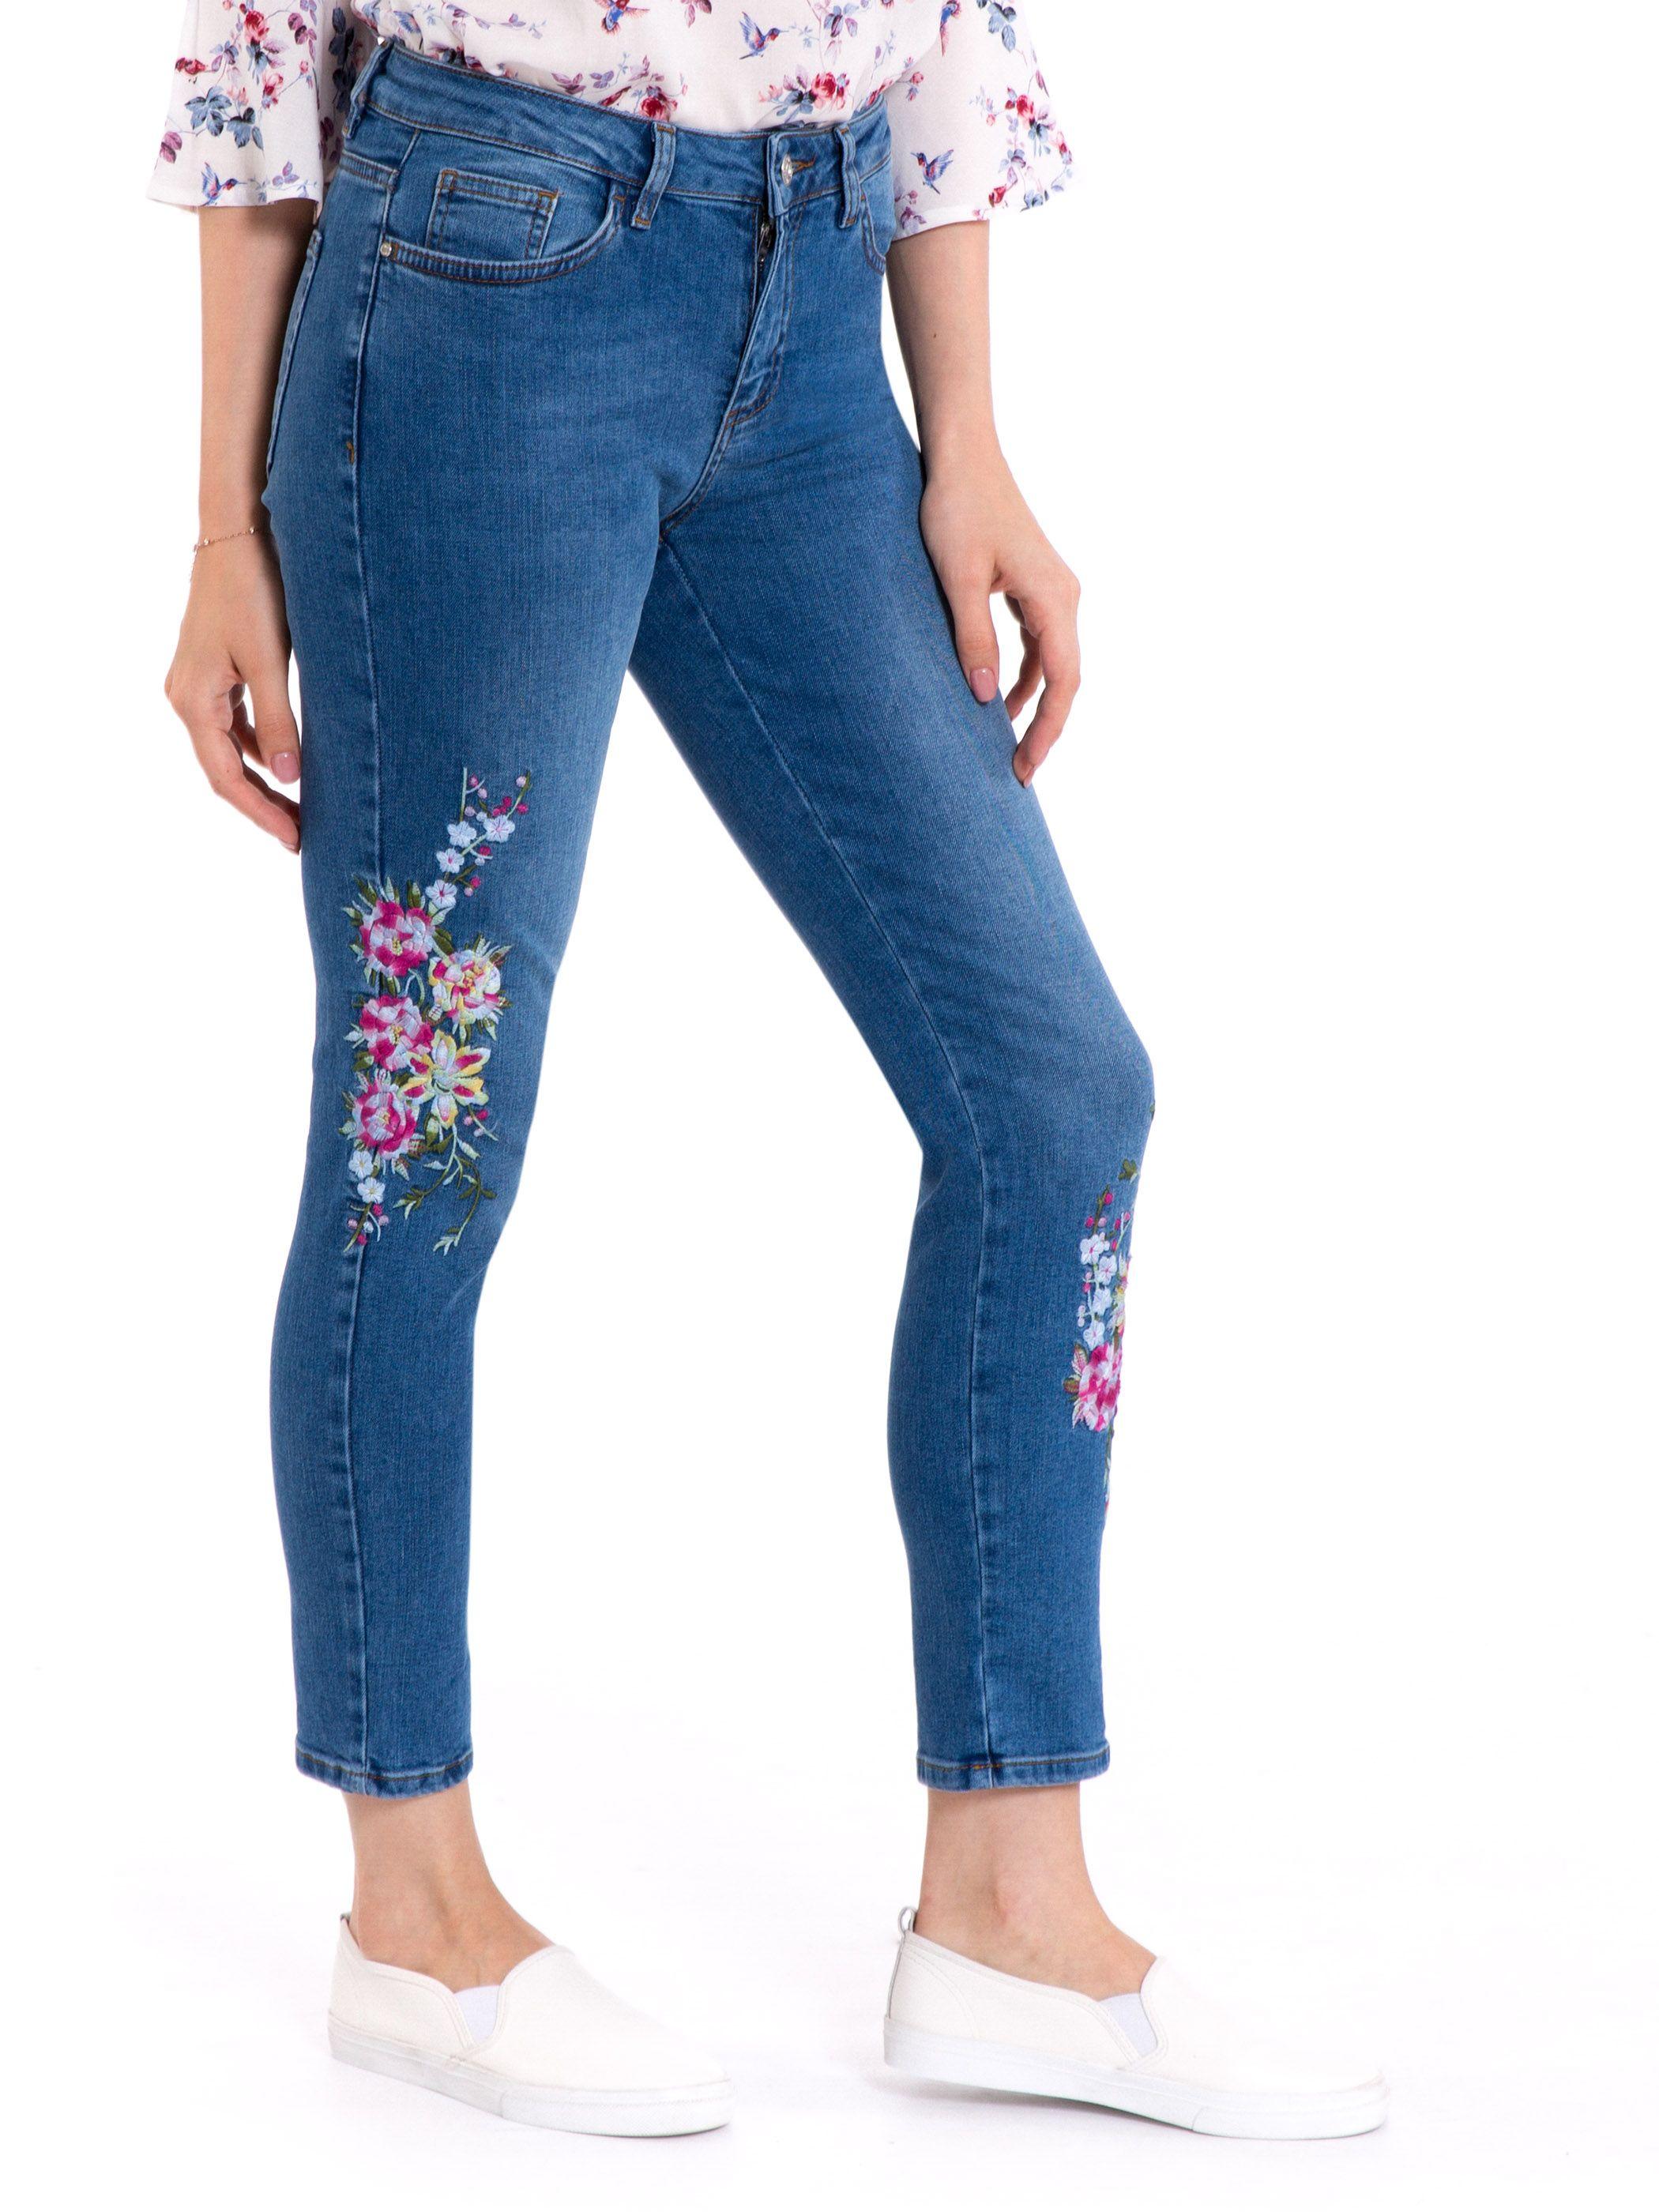 Pantolon Lc Waikiki 59 95 Tl Pantolon Indigo Kotlar